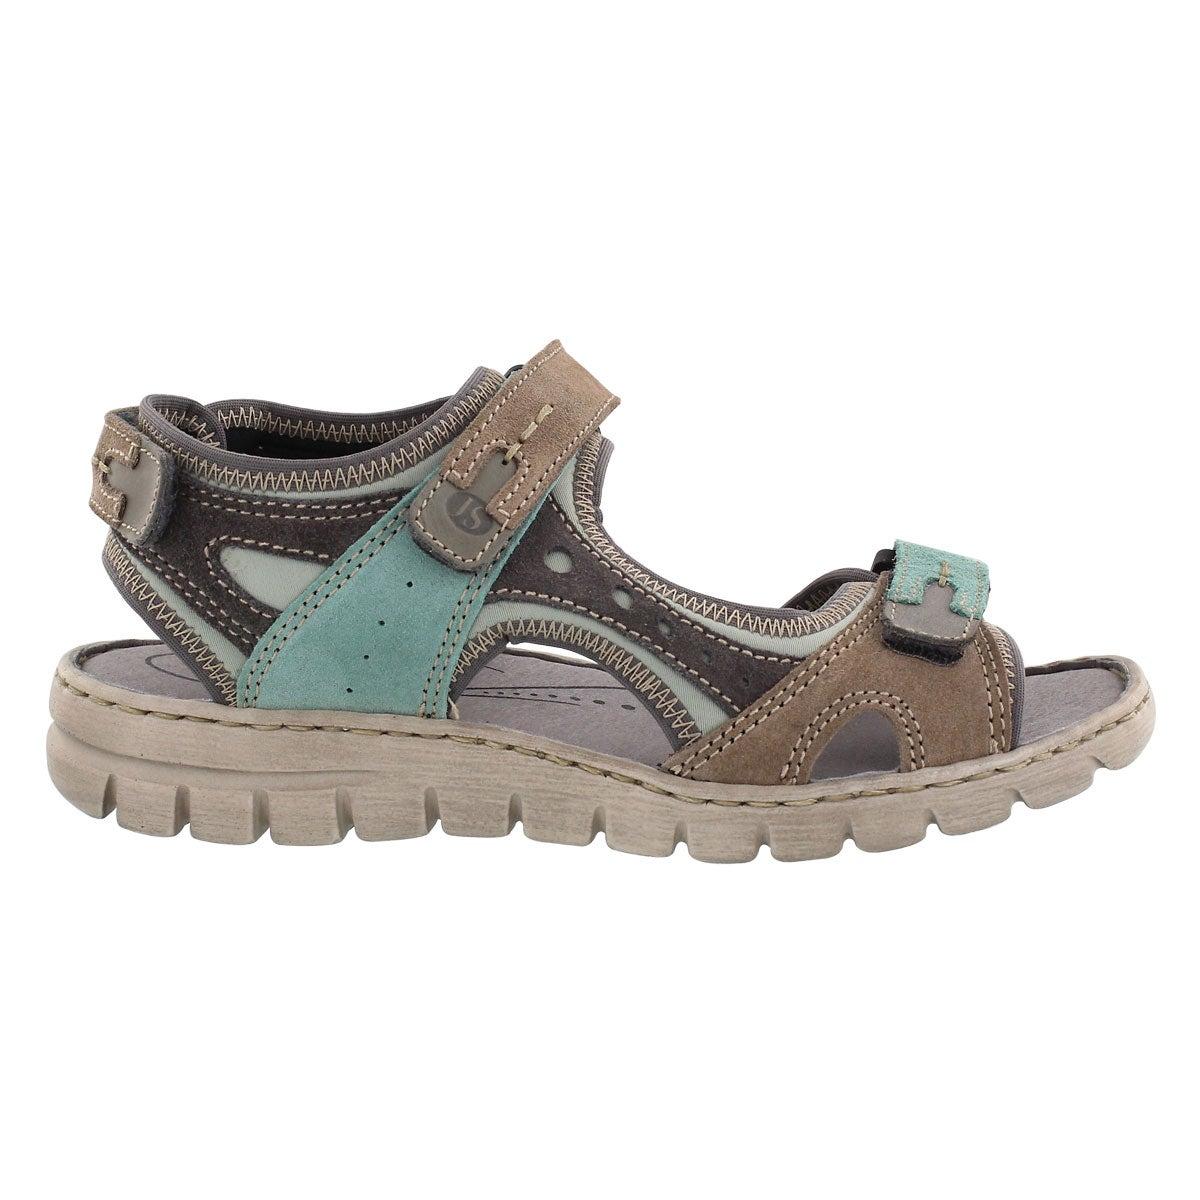 Lds Stefanie 23 mint multi sport sandal